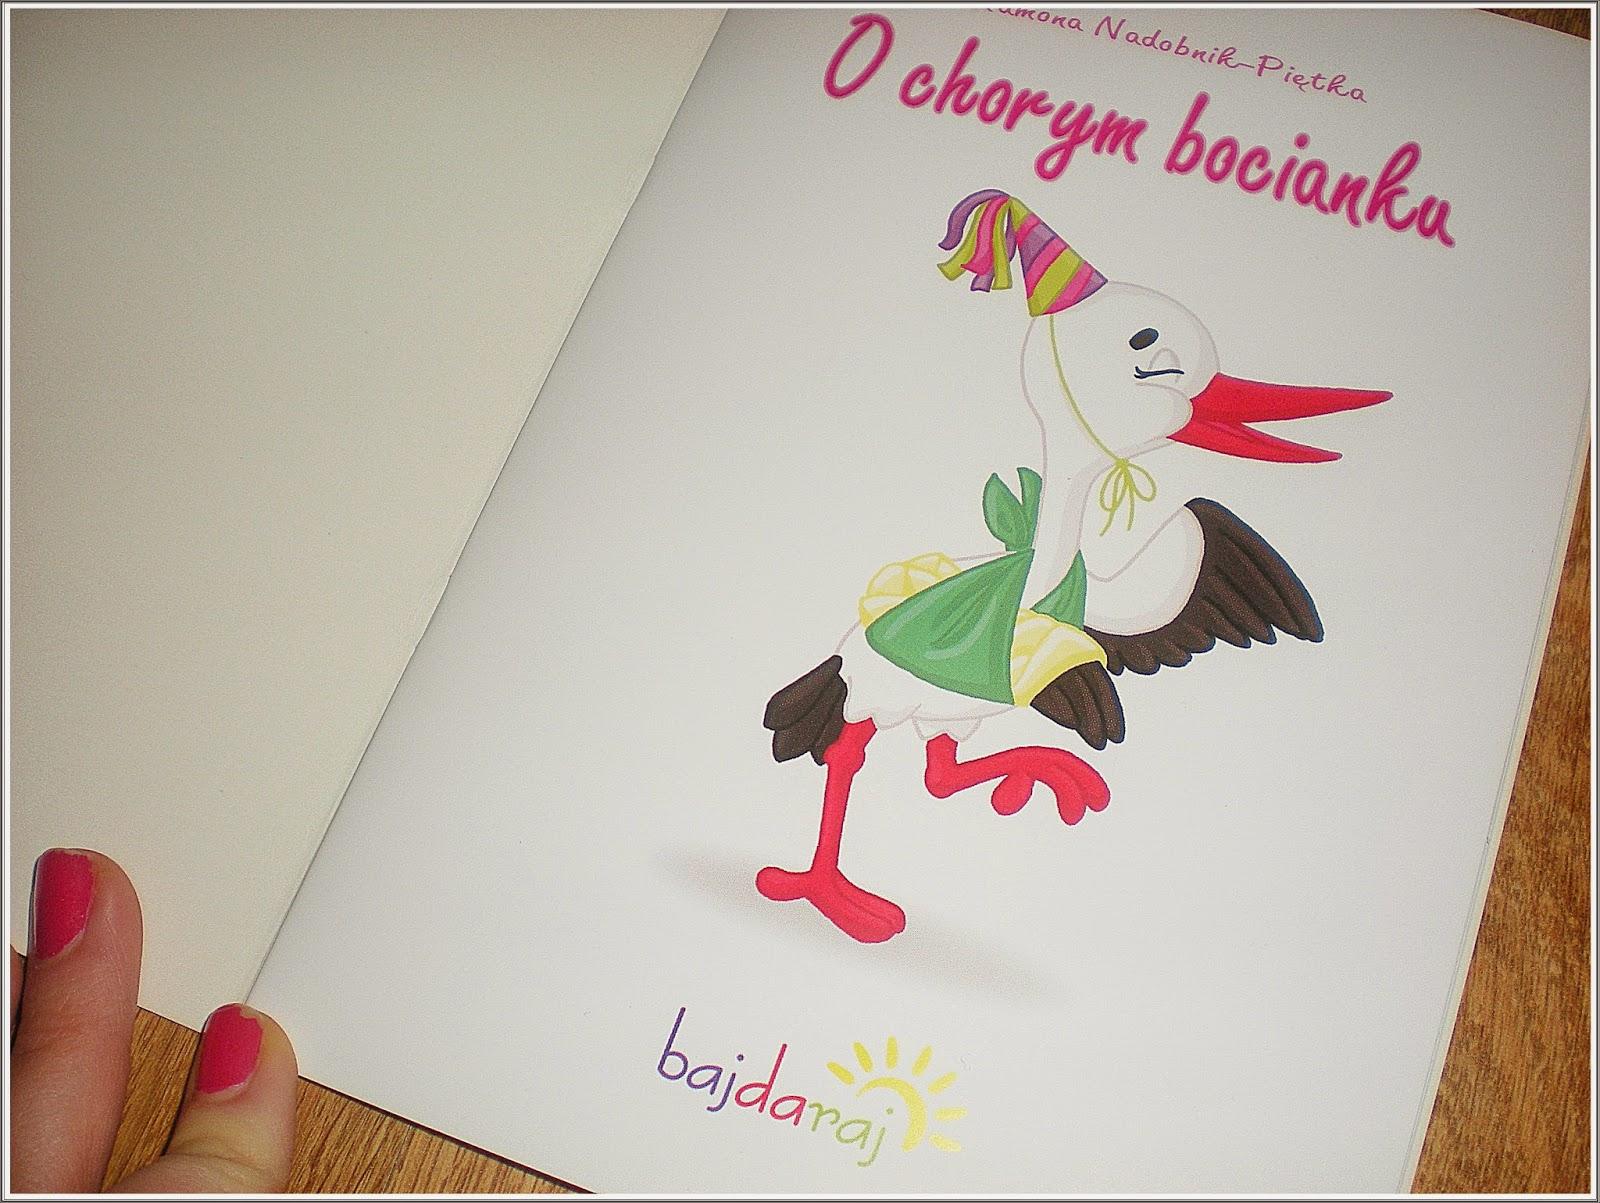 O chorym bocianku / O zielonych ludkach / Bajdaraj